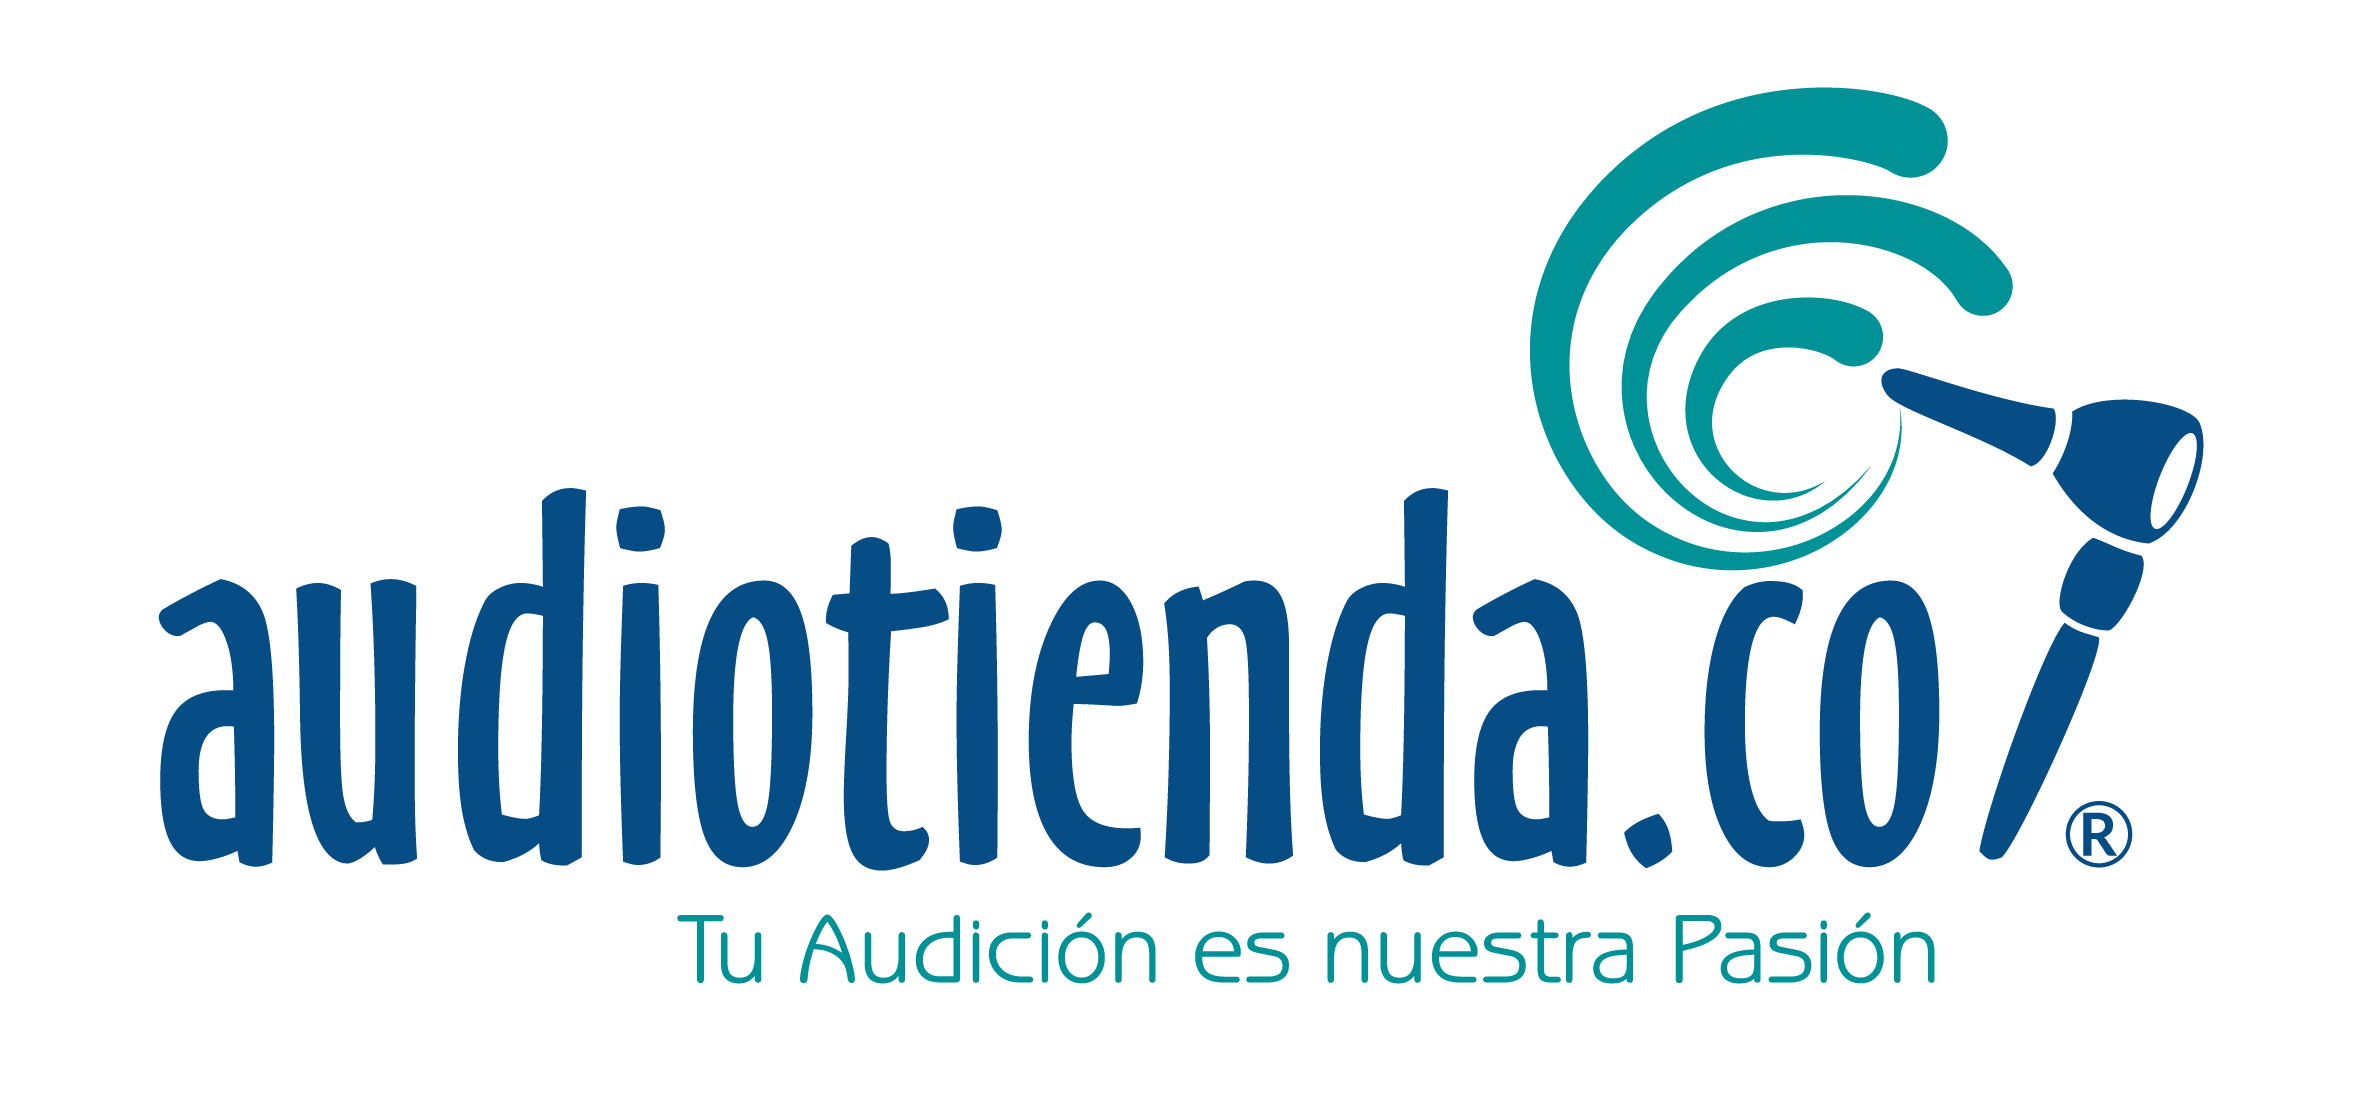 Audiotienda.co